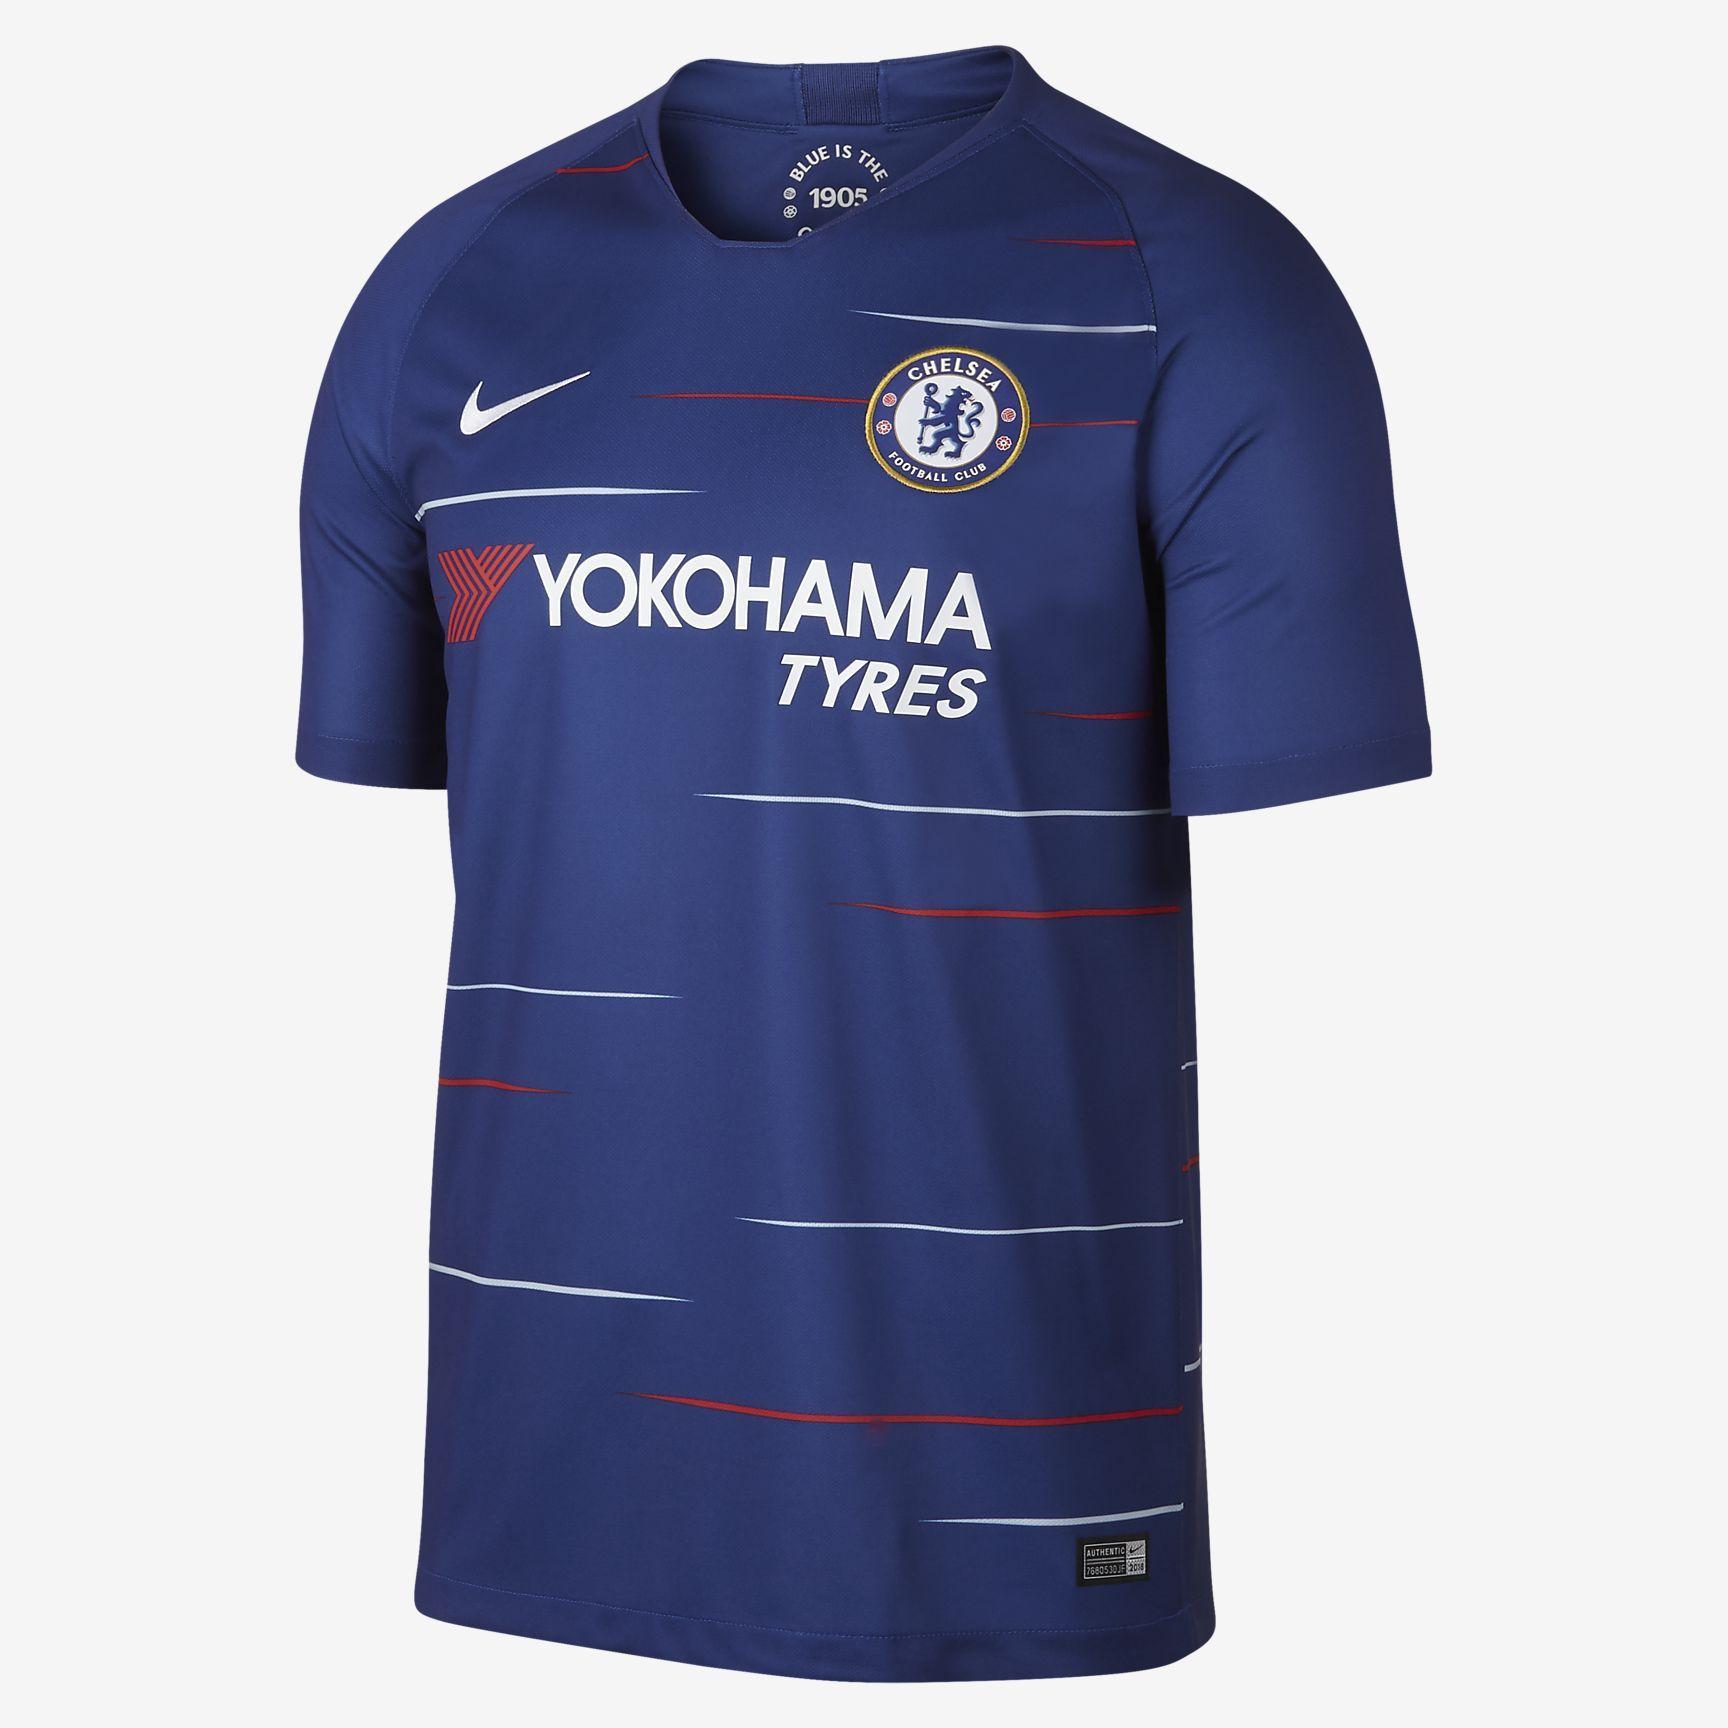 e73efad6c12 2018 19 Chelsea FC Stadium Home Men s Football Shirt